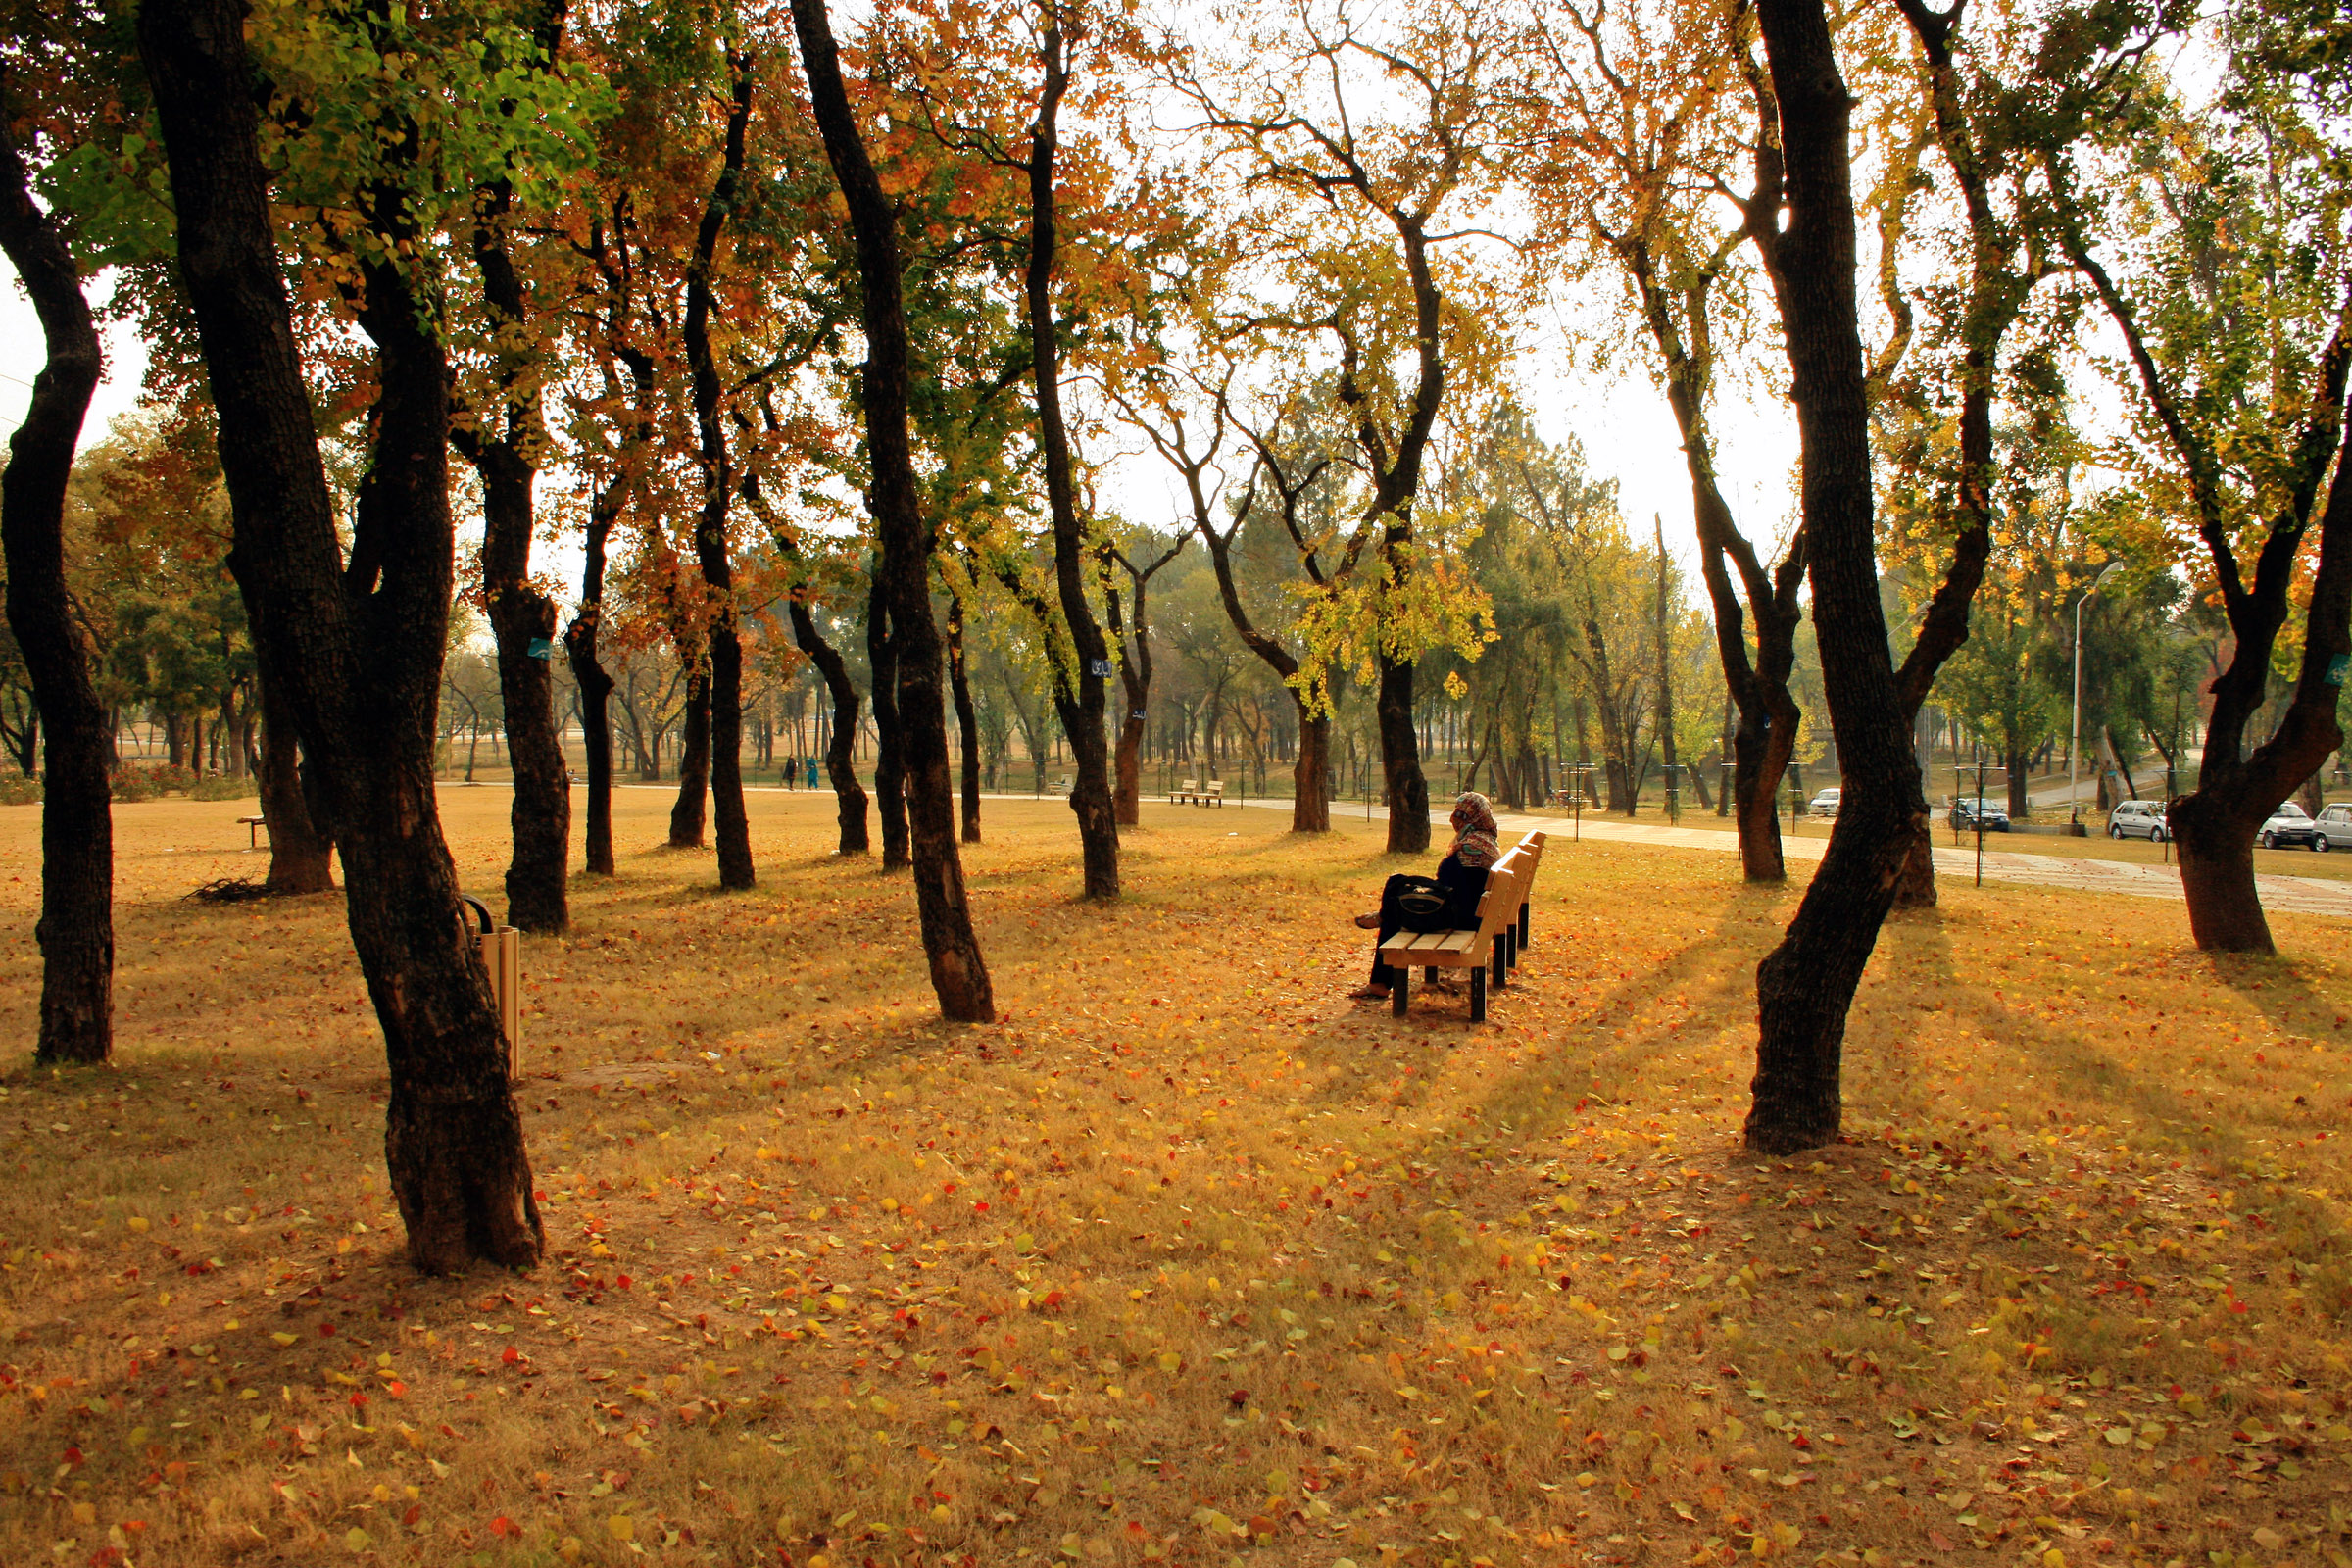 Autumn in Islamabad, Pakistan - by Muzaffar Bukhari